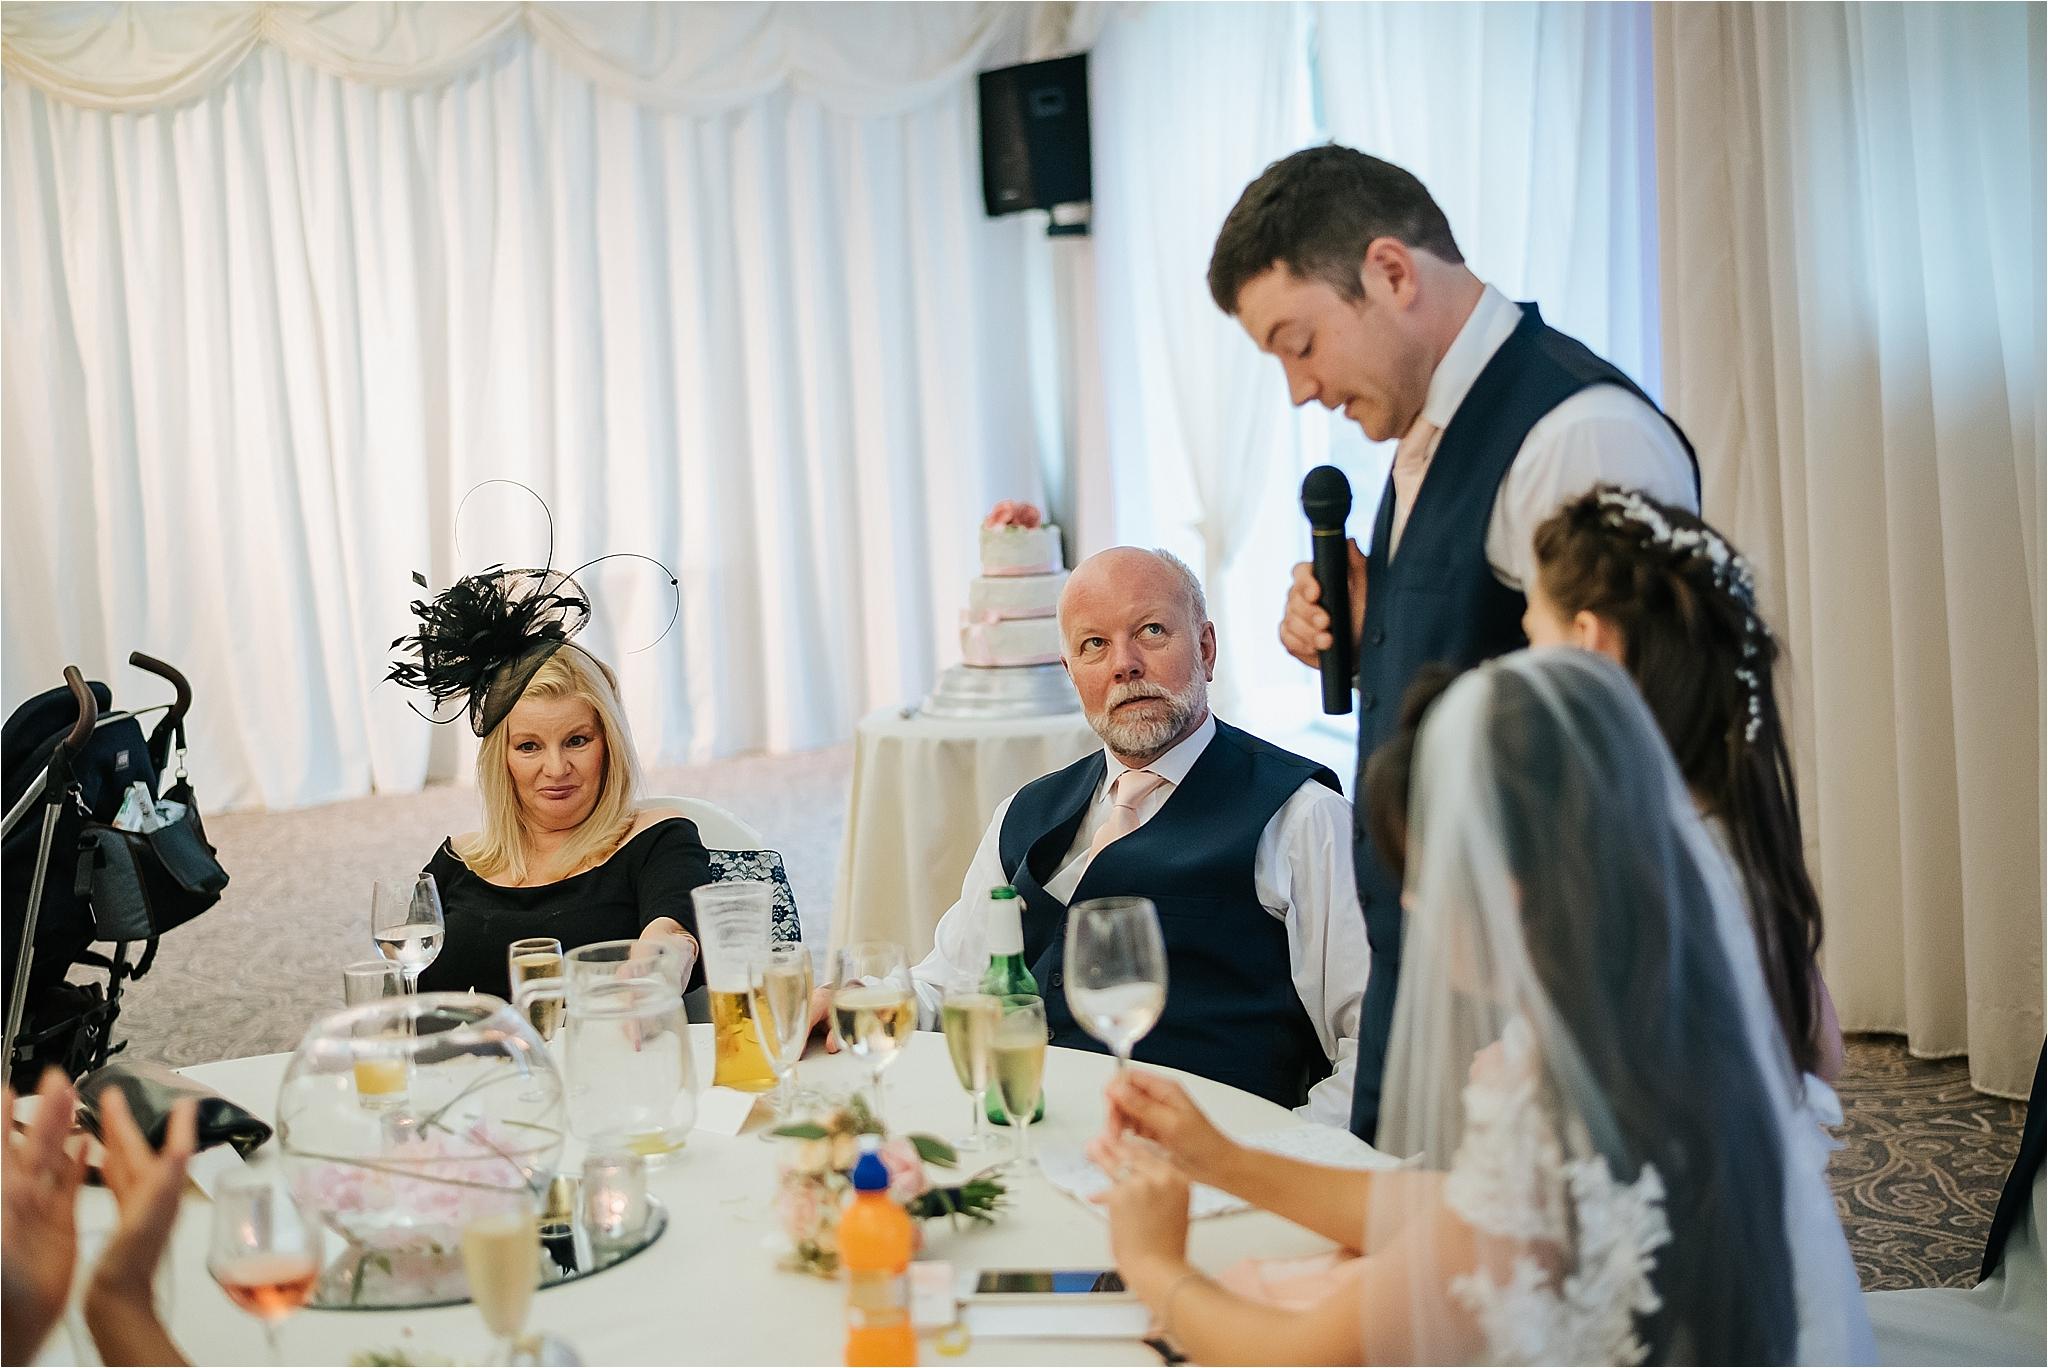 thevilla+lancashire+wreagreen+wedding+photographer47.jpg